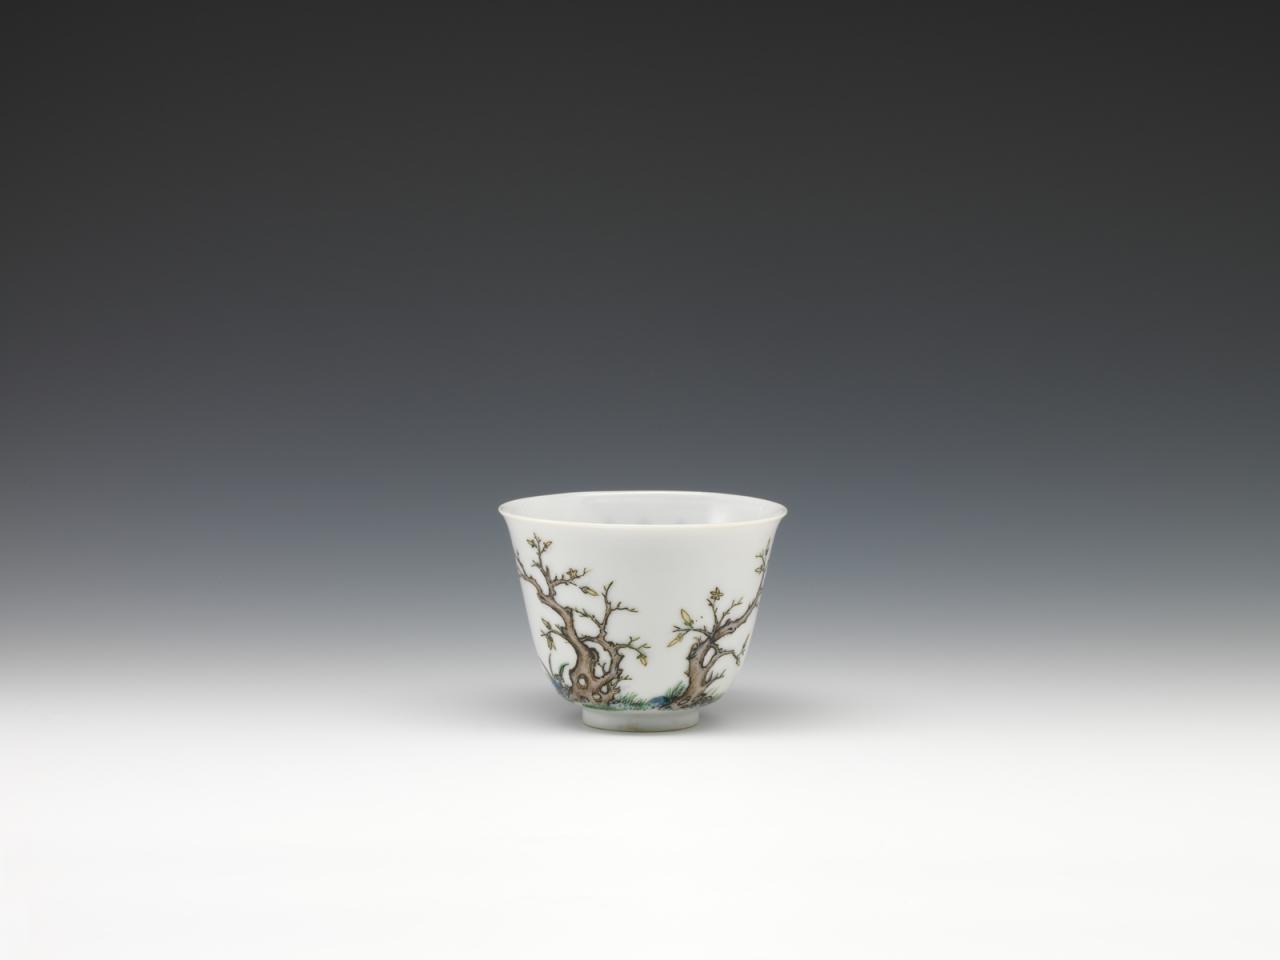 Twelve cups with flowers representing the twelve months in wucai enamels-December image